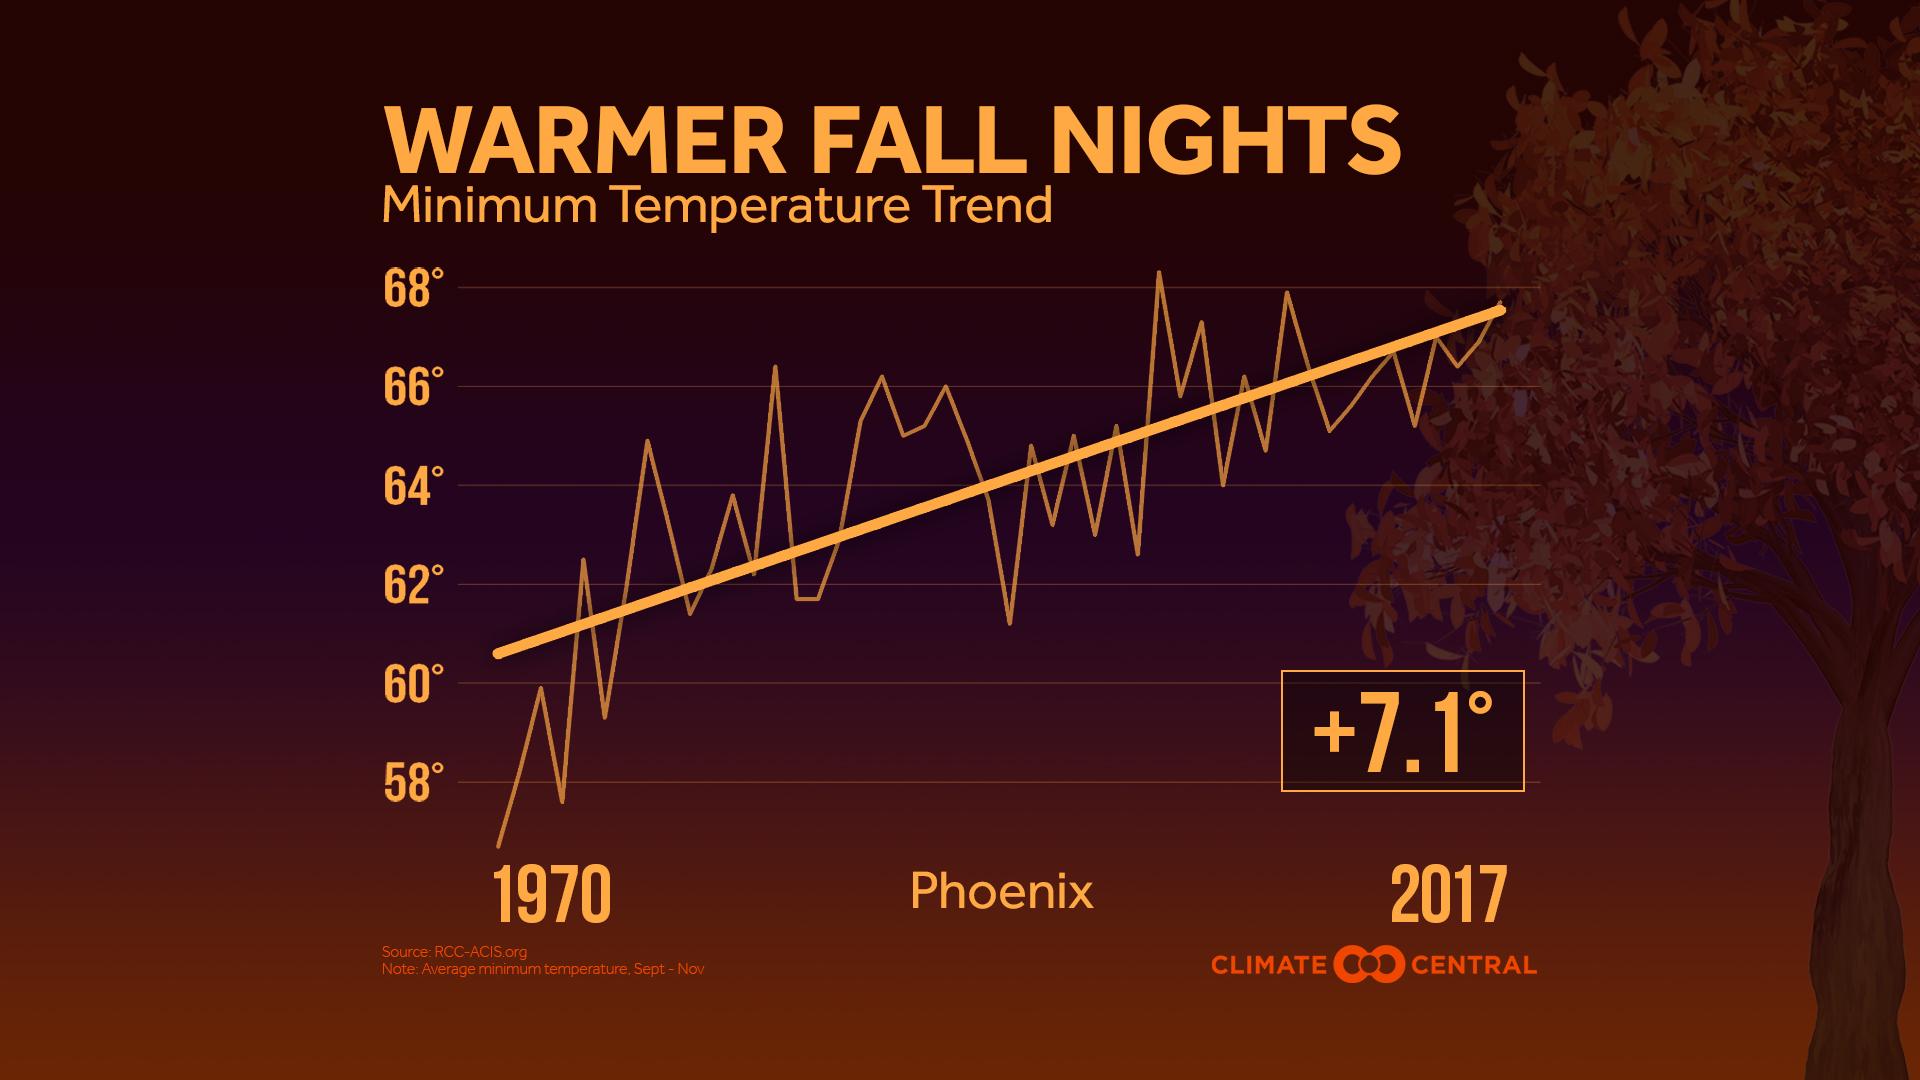 warmer fall nights